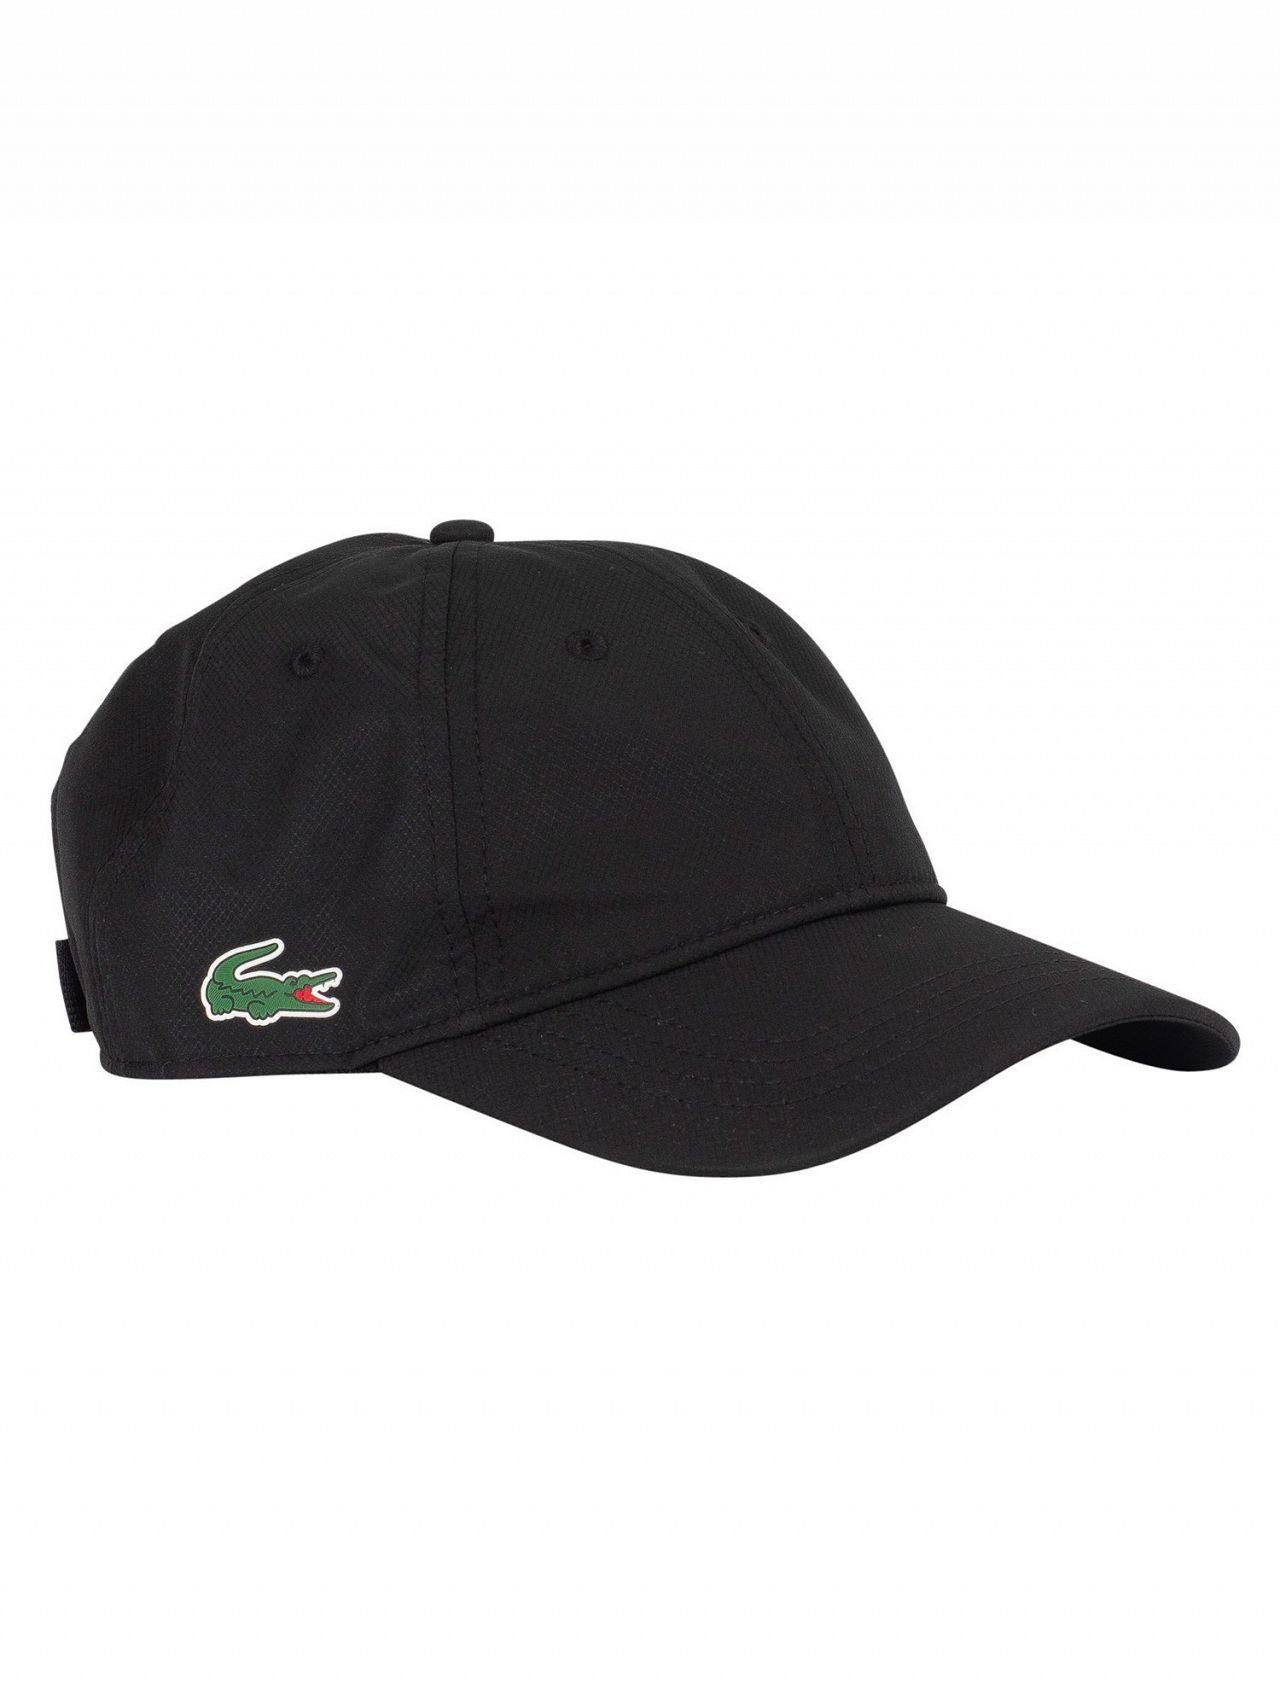 Lacoste Black Small Logo Baseball Cap. Tap to expand fb53b542761